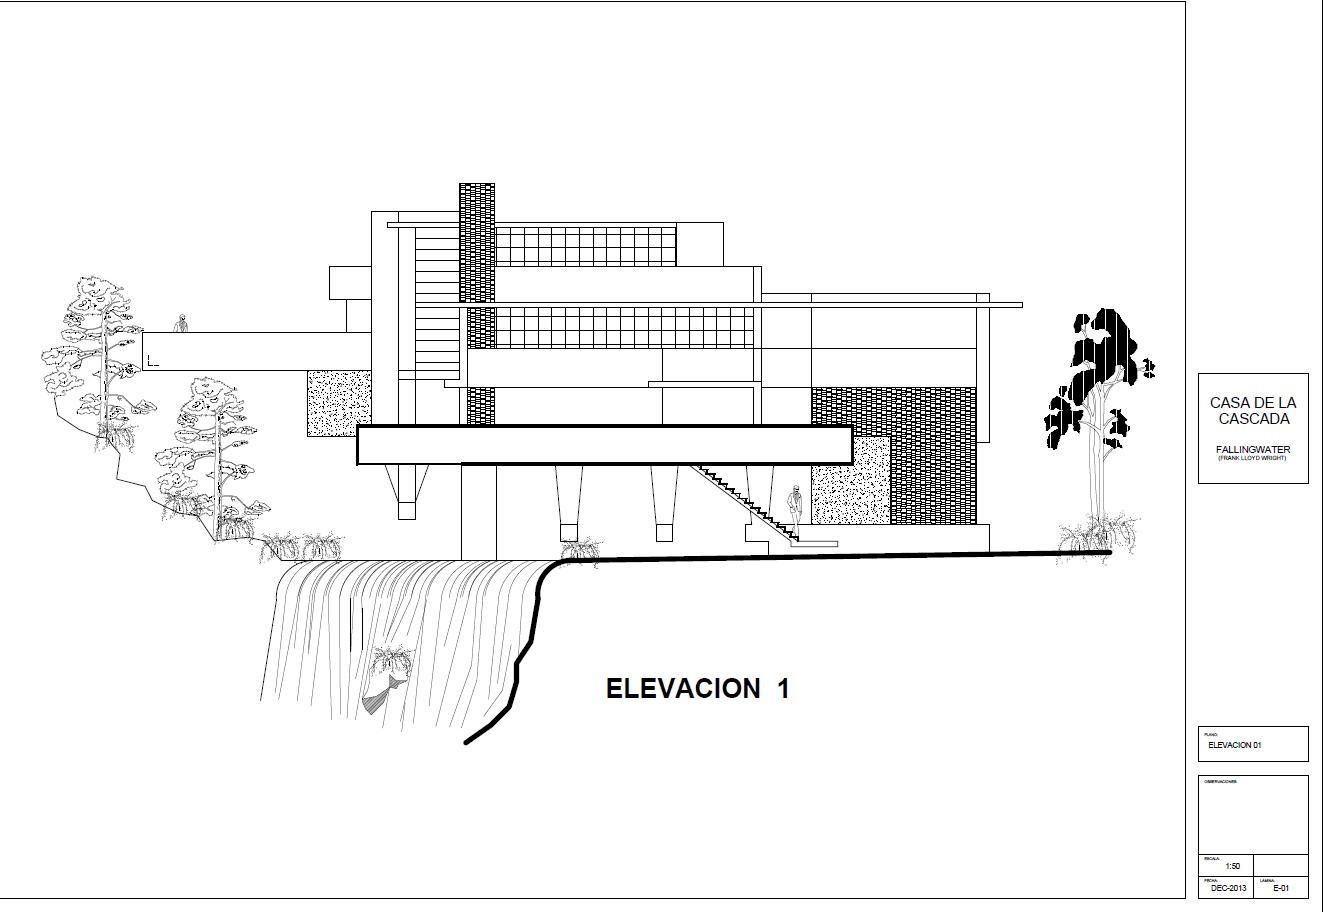 Historia De La Arquitectura Casa Kaufmann o casa de la cascada